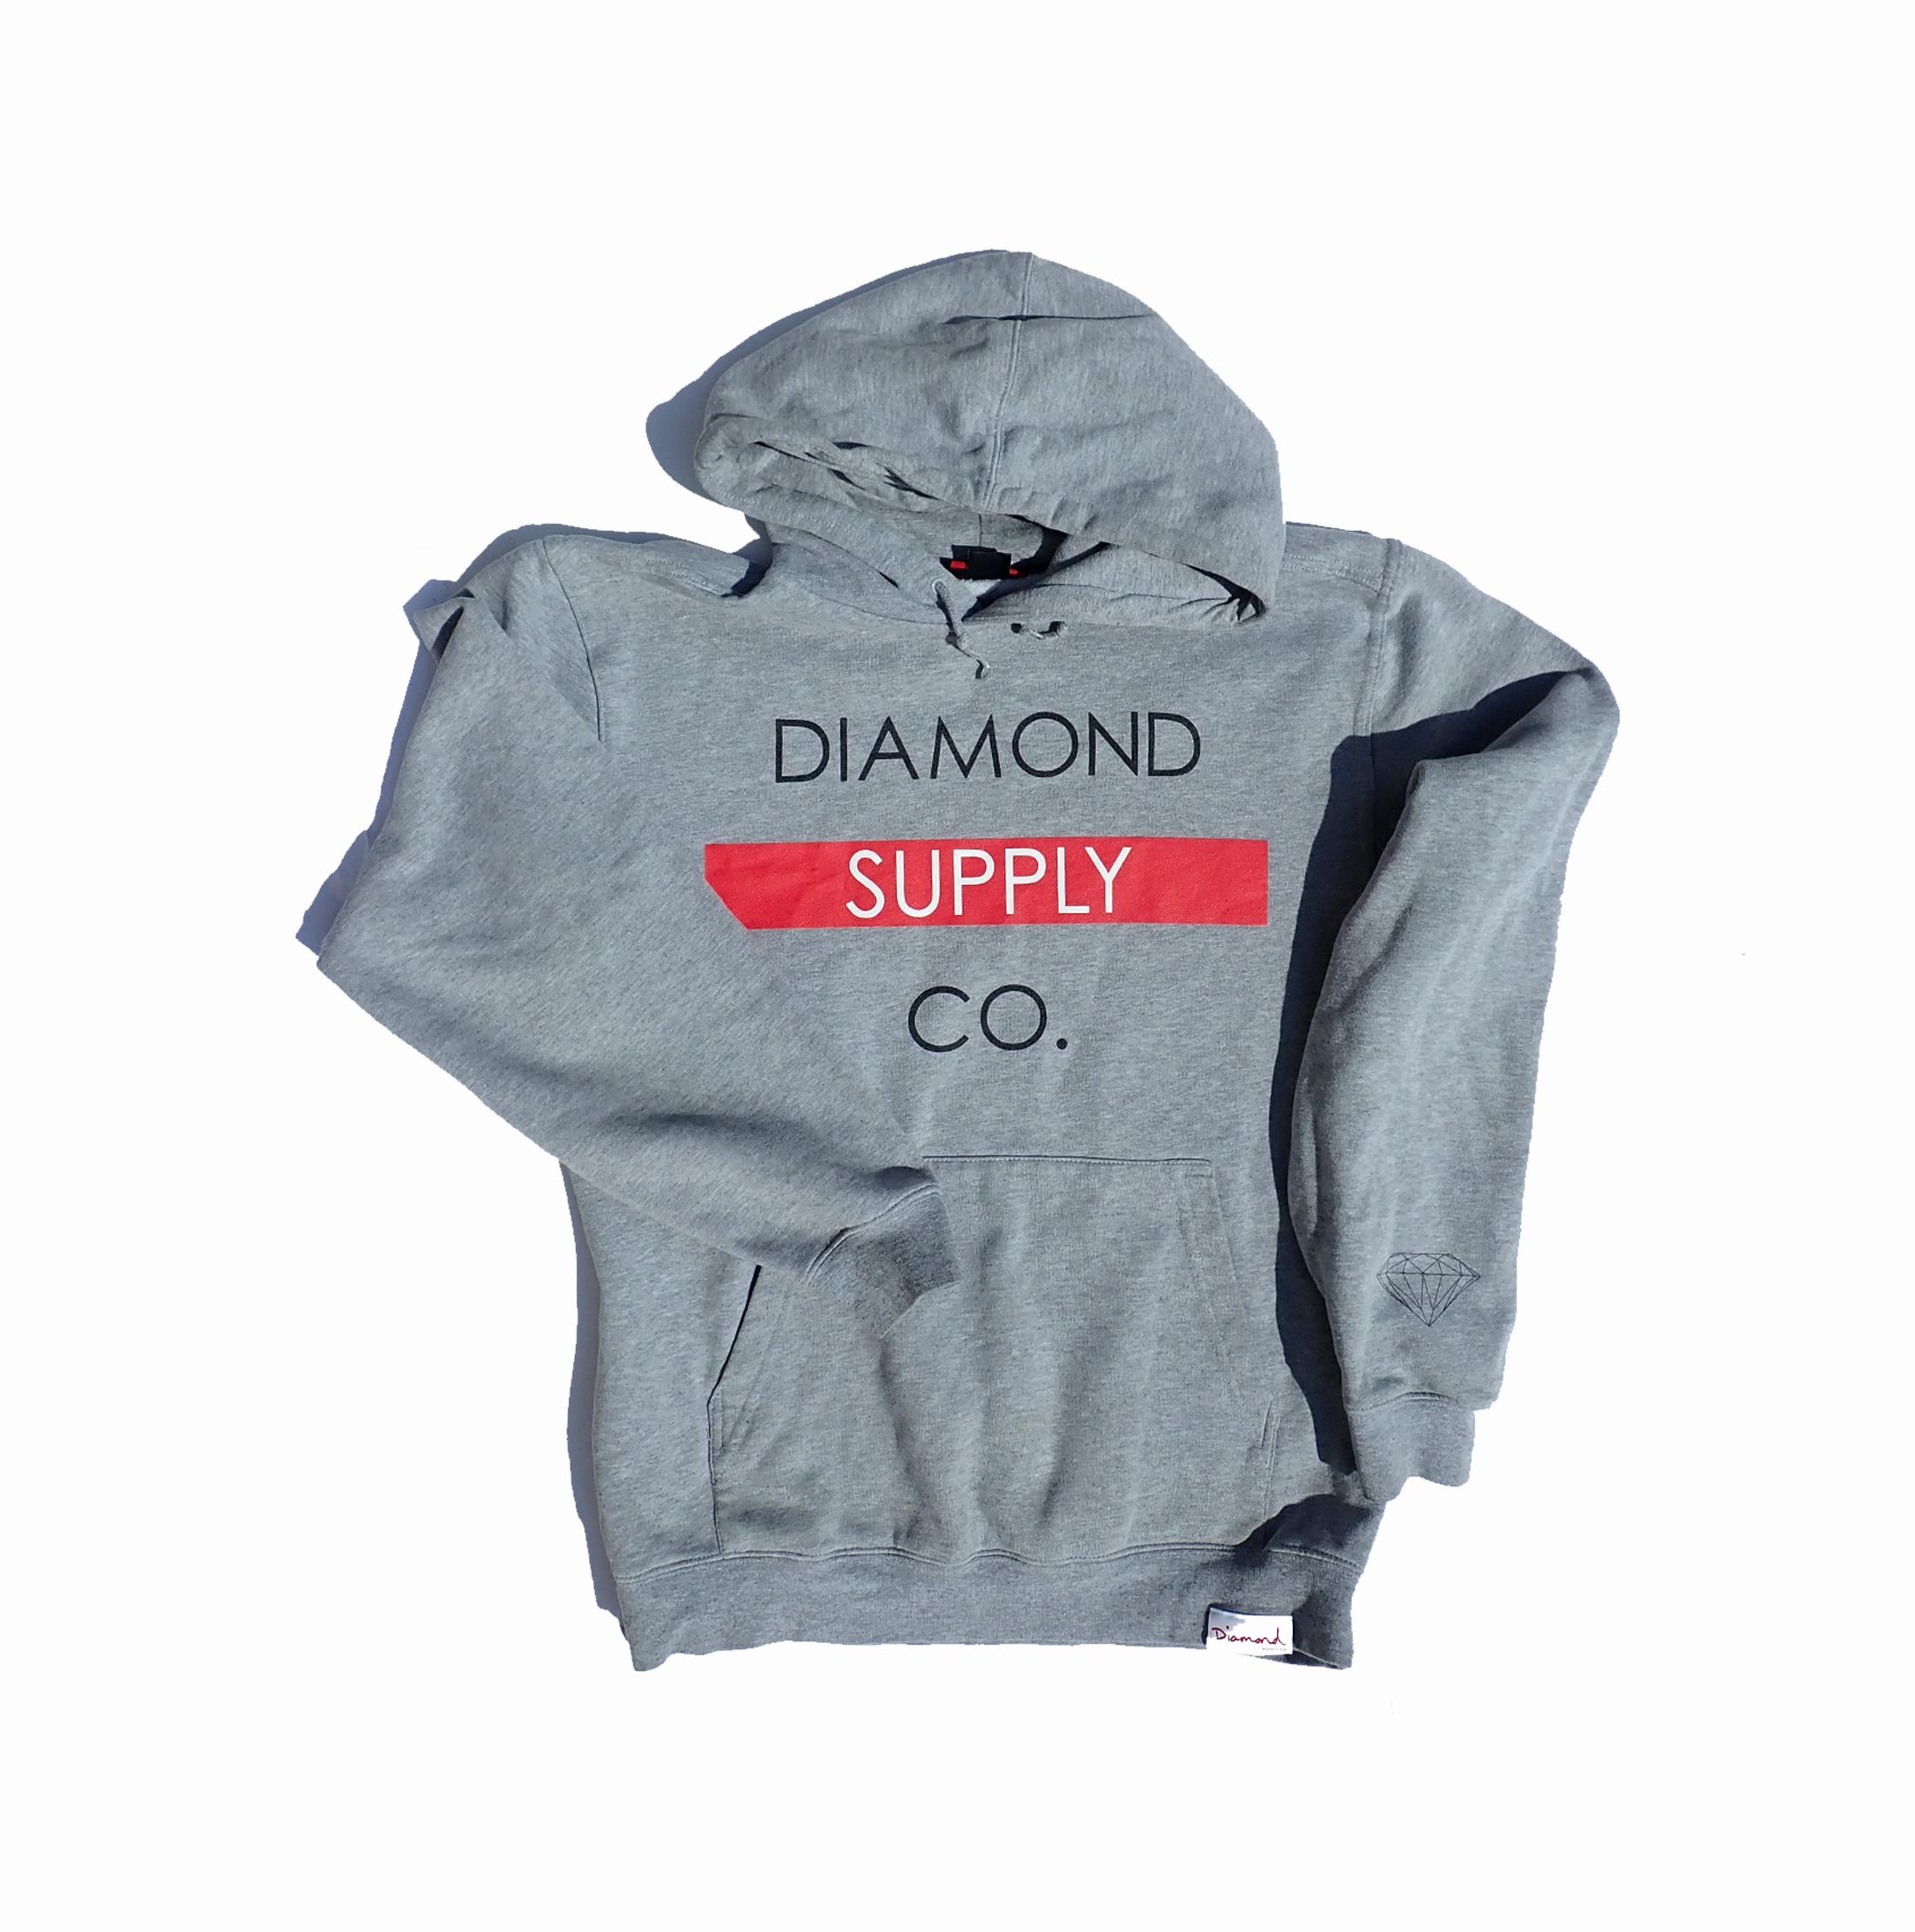 Diamond Supply Co. Grey Hoodie